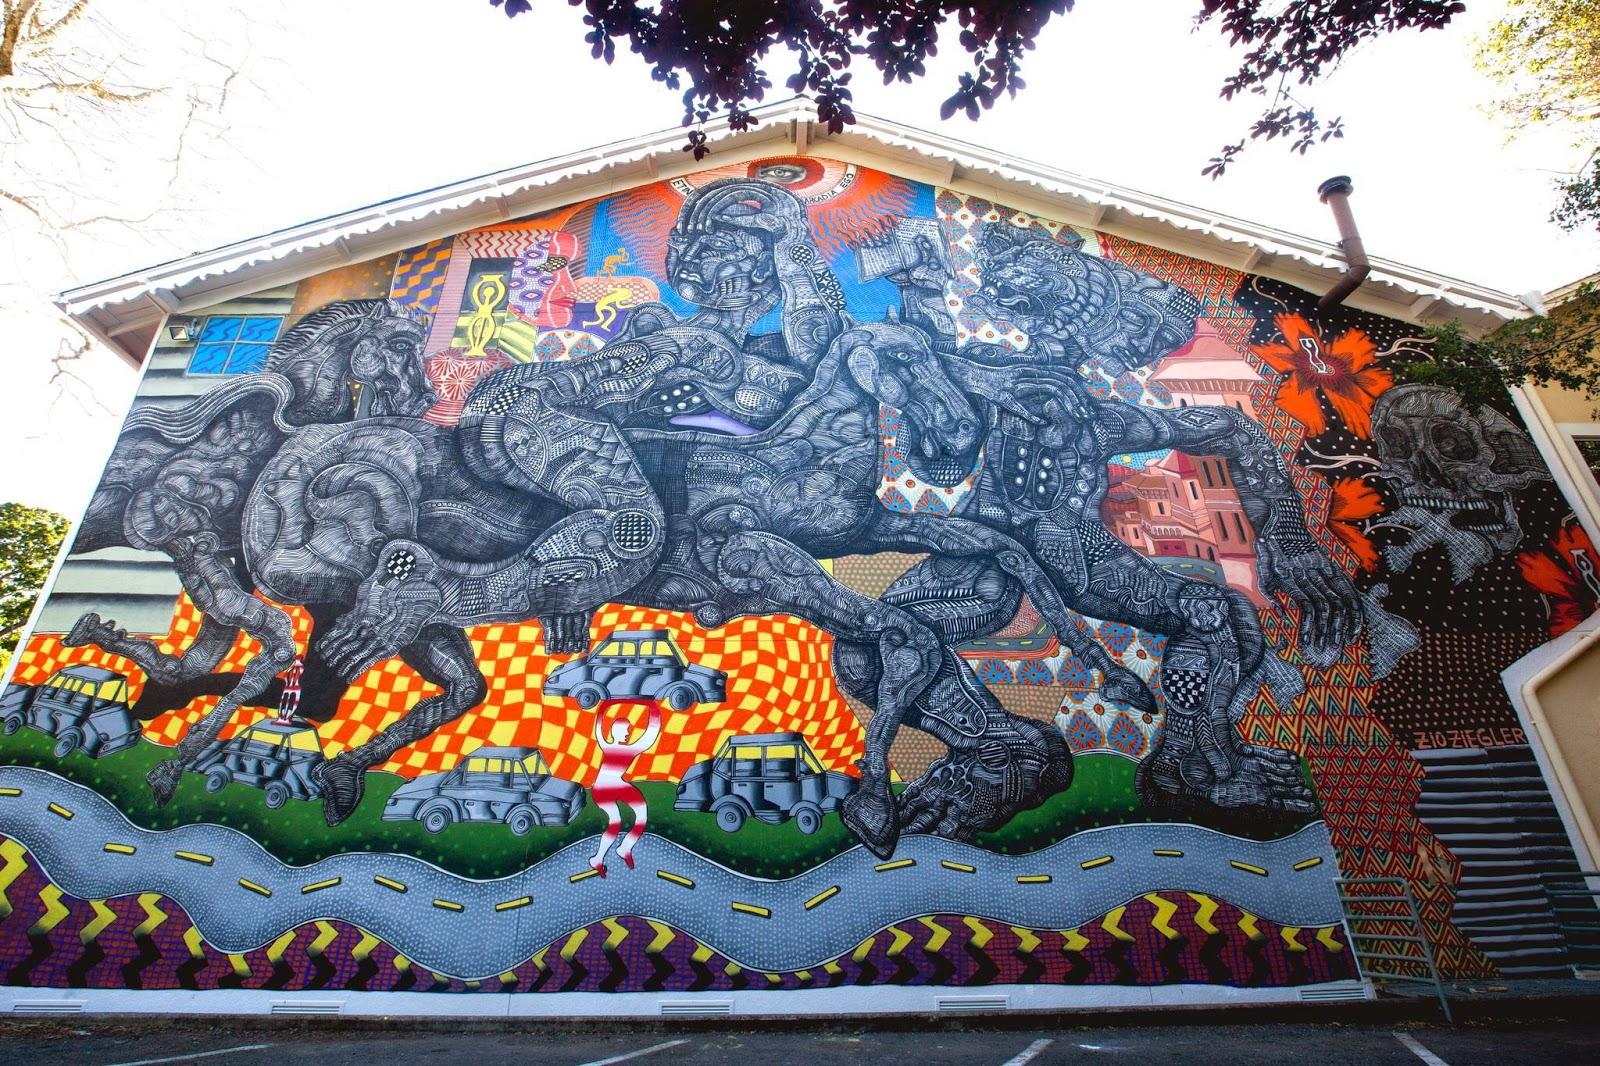 Zio ziegler creates a new mural in ross california for California mural